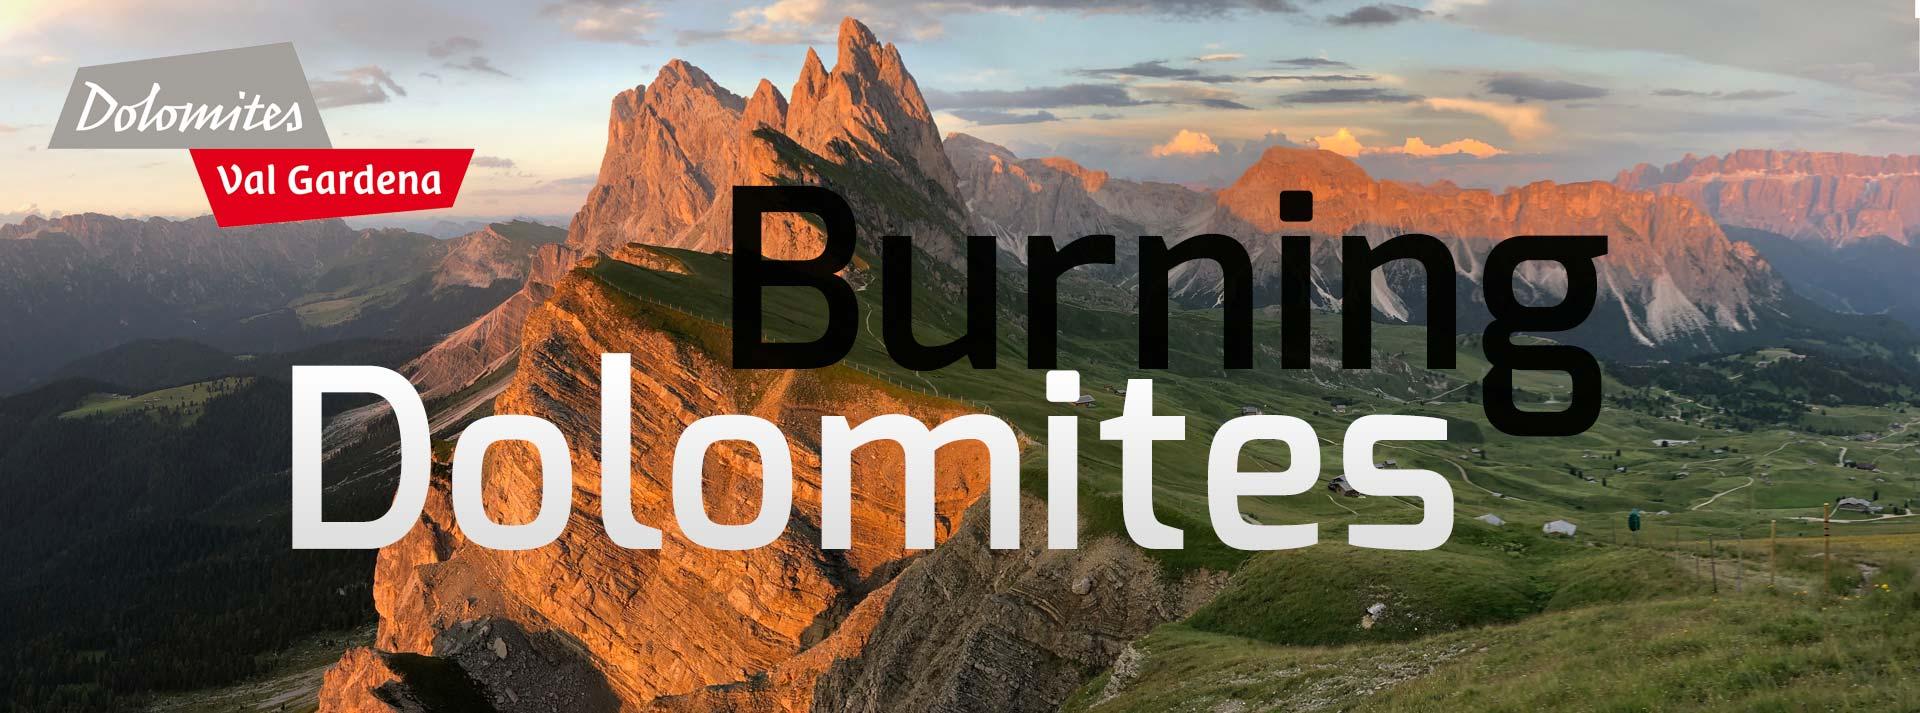 Burning Dolomites in autumn -